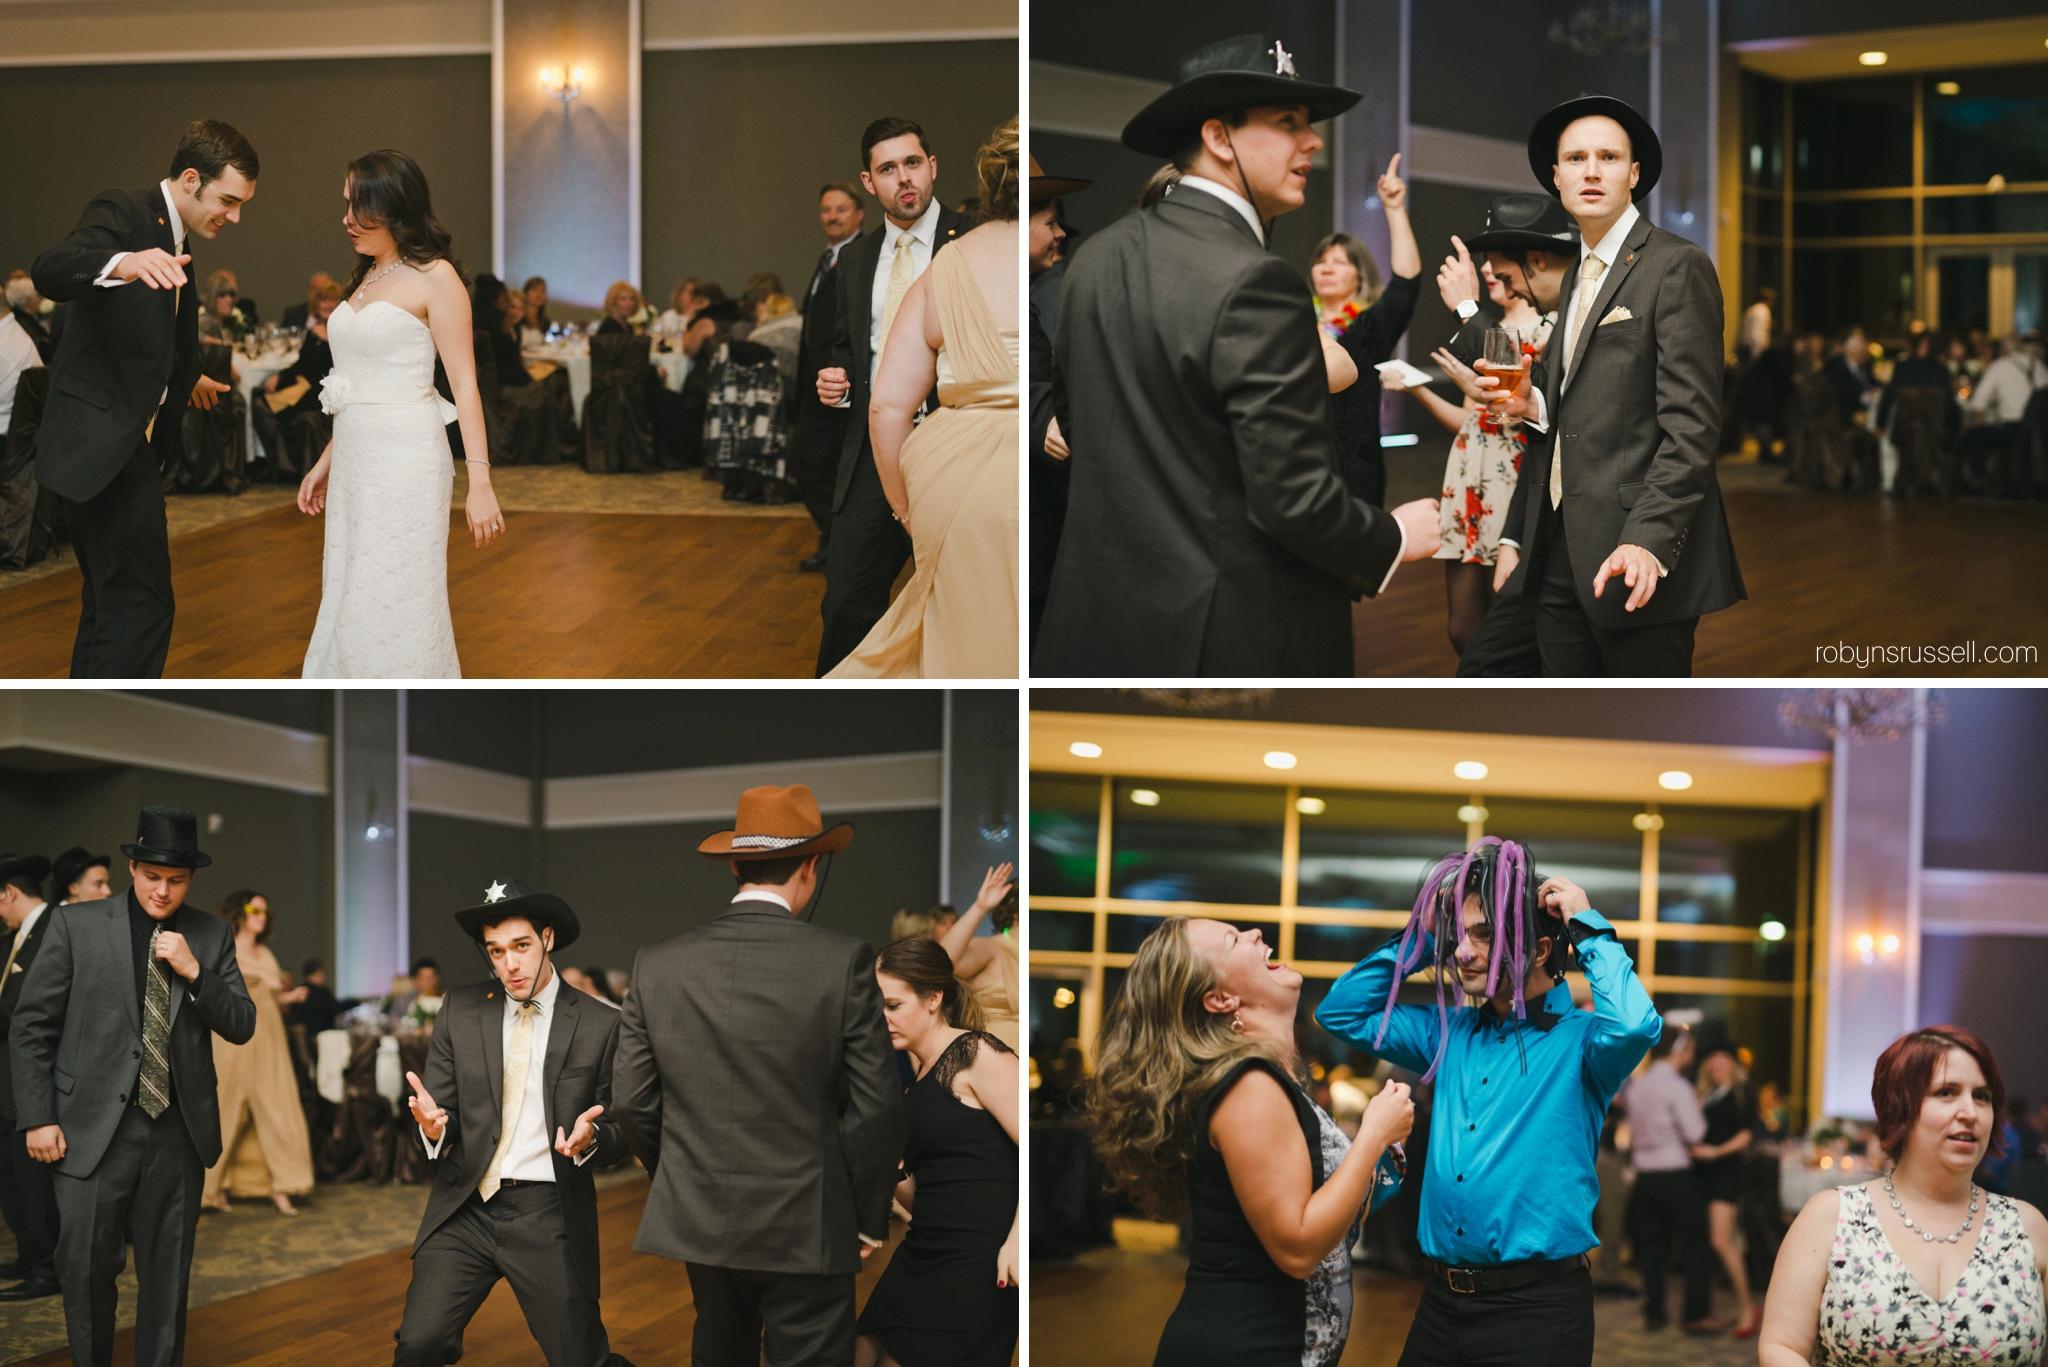 68-guests-dancing-at-wedding.jpg